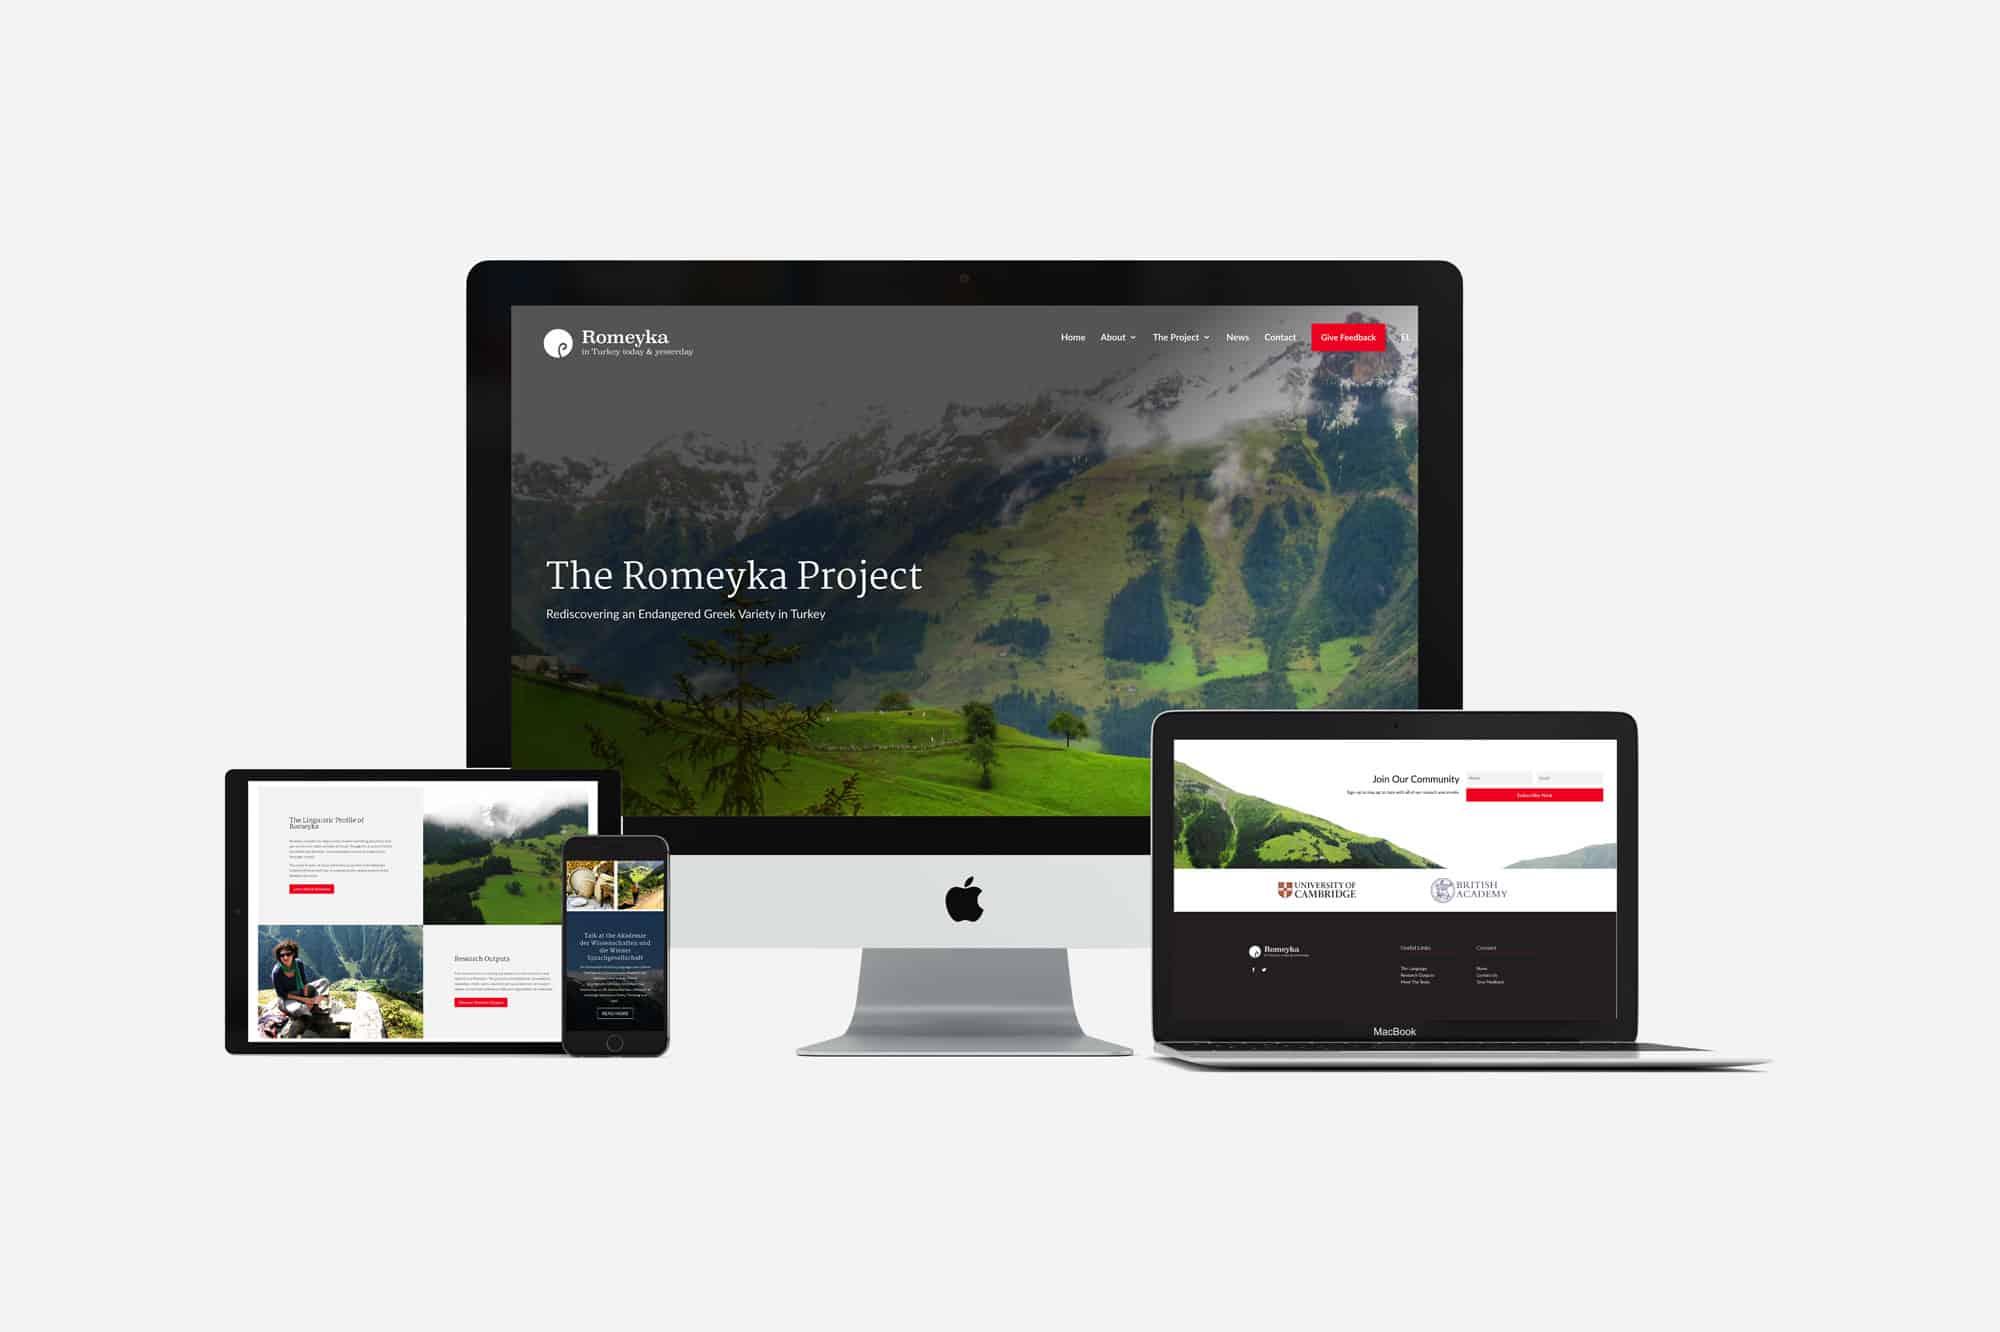 romeyka project responsive websitee design cambridge university